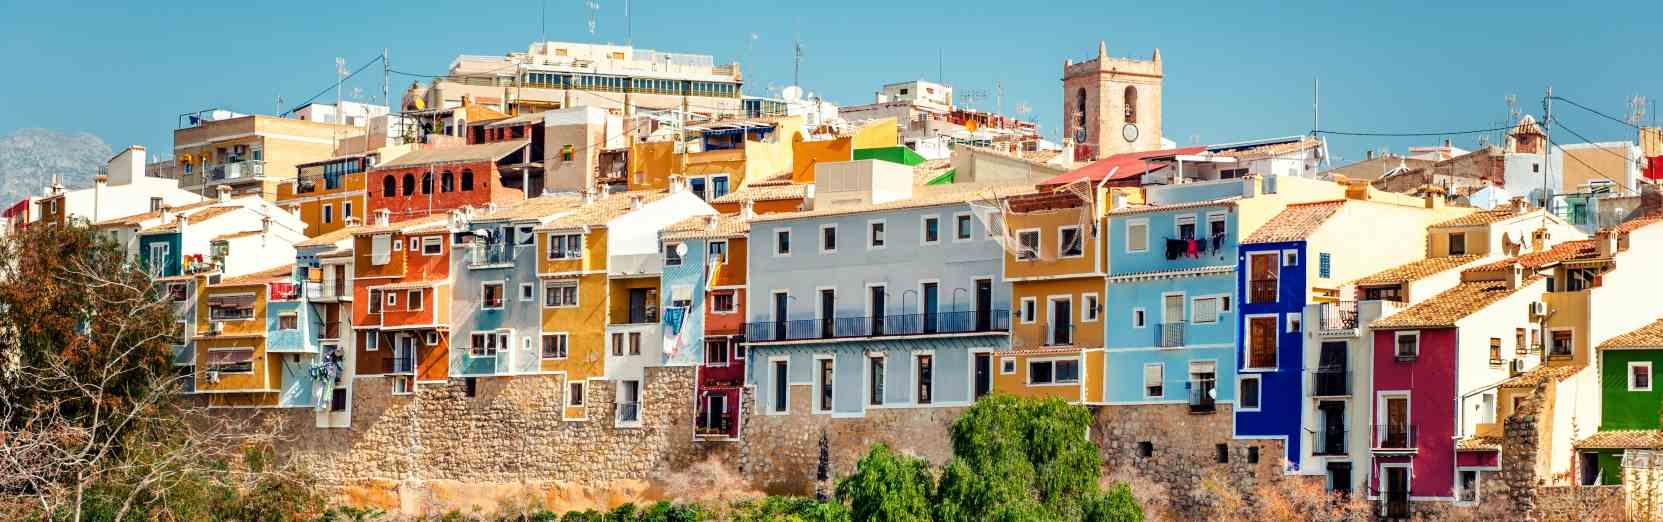 Mietwagen ohne Kreditkarte Alicante